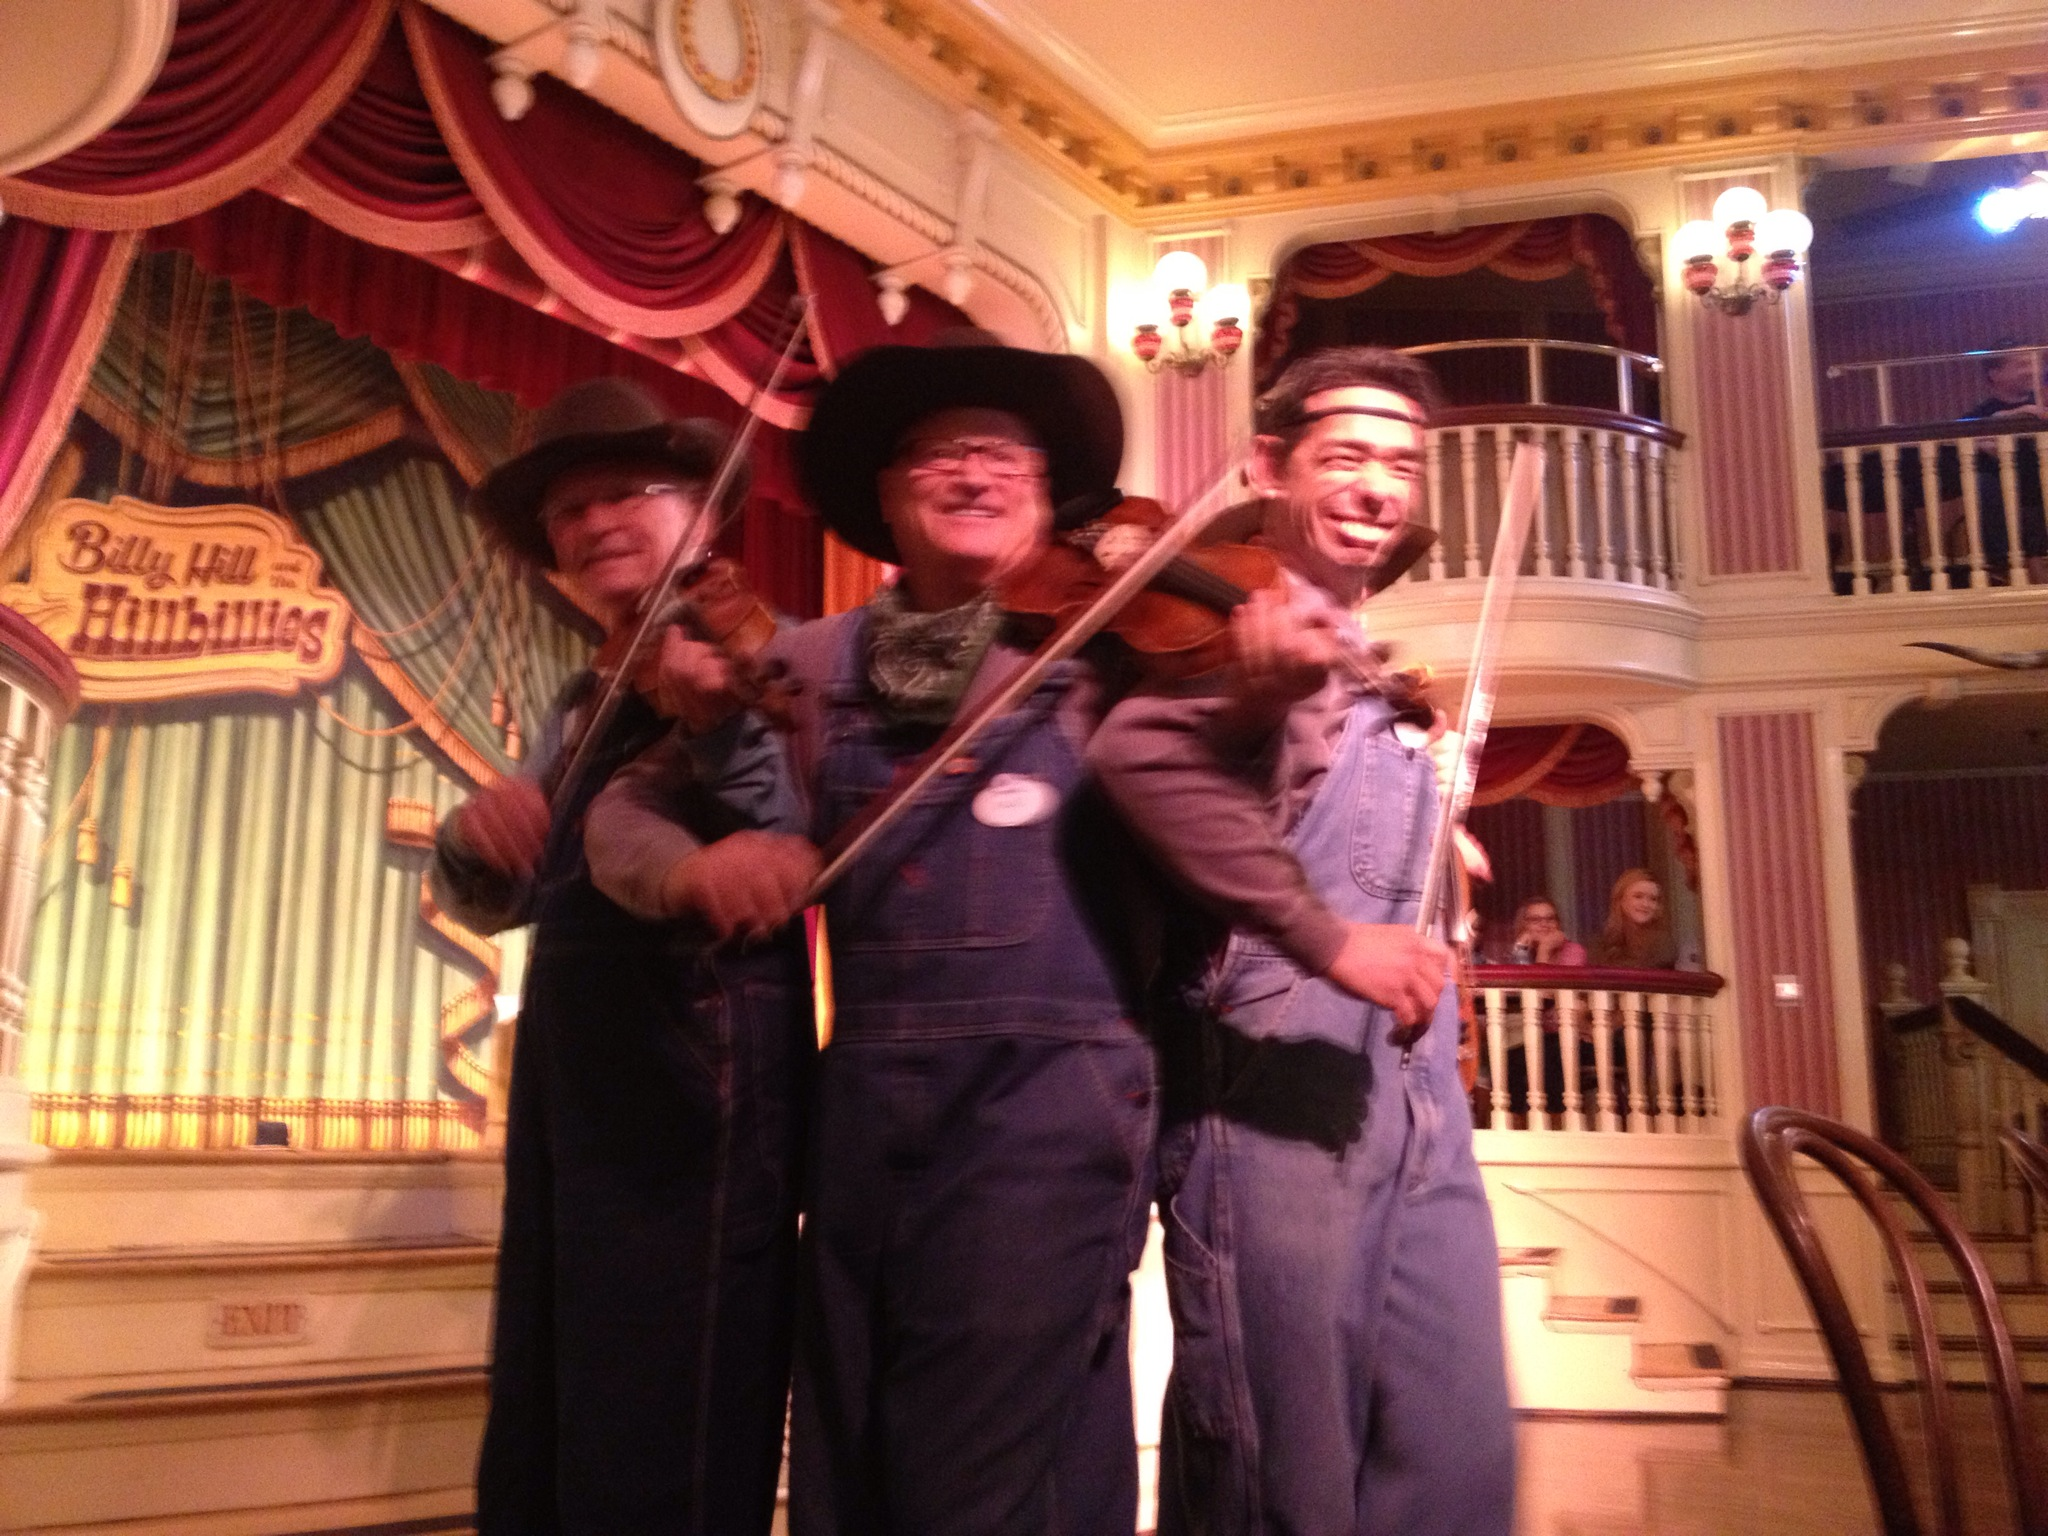 Disneyland Debate: Where Do Billy Hill and the Hillbillies